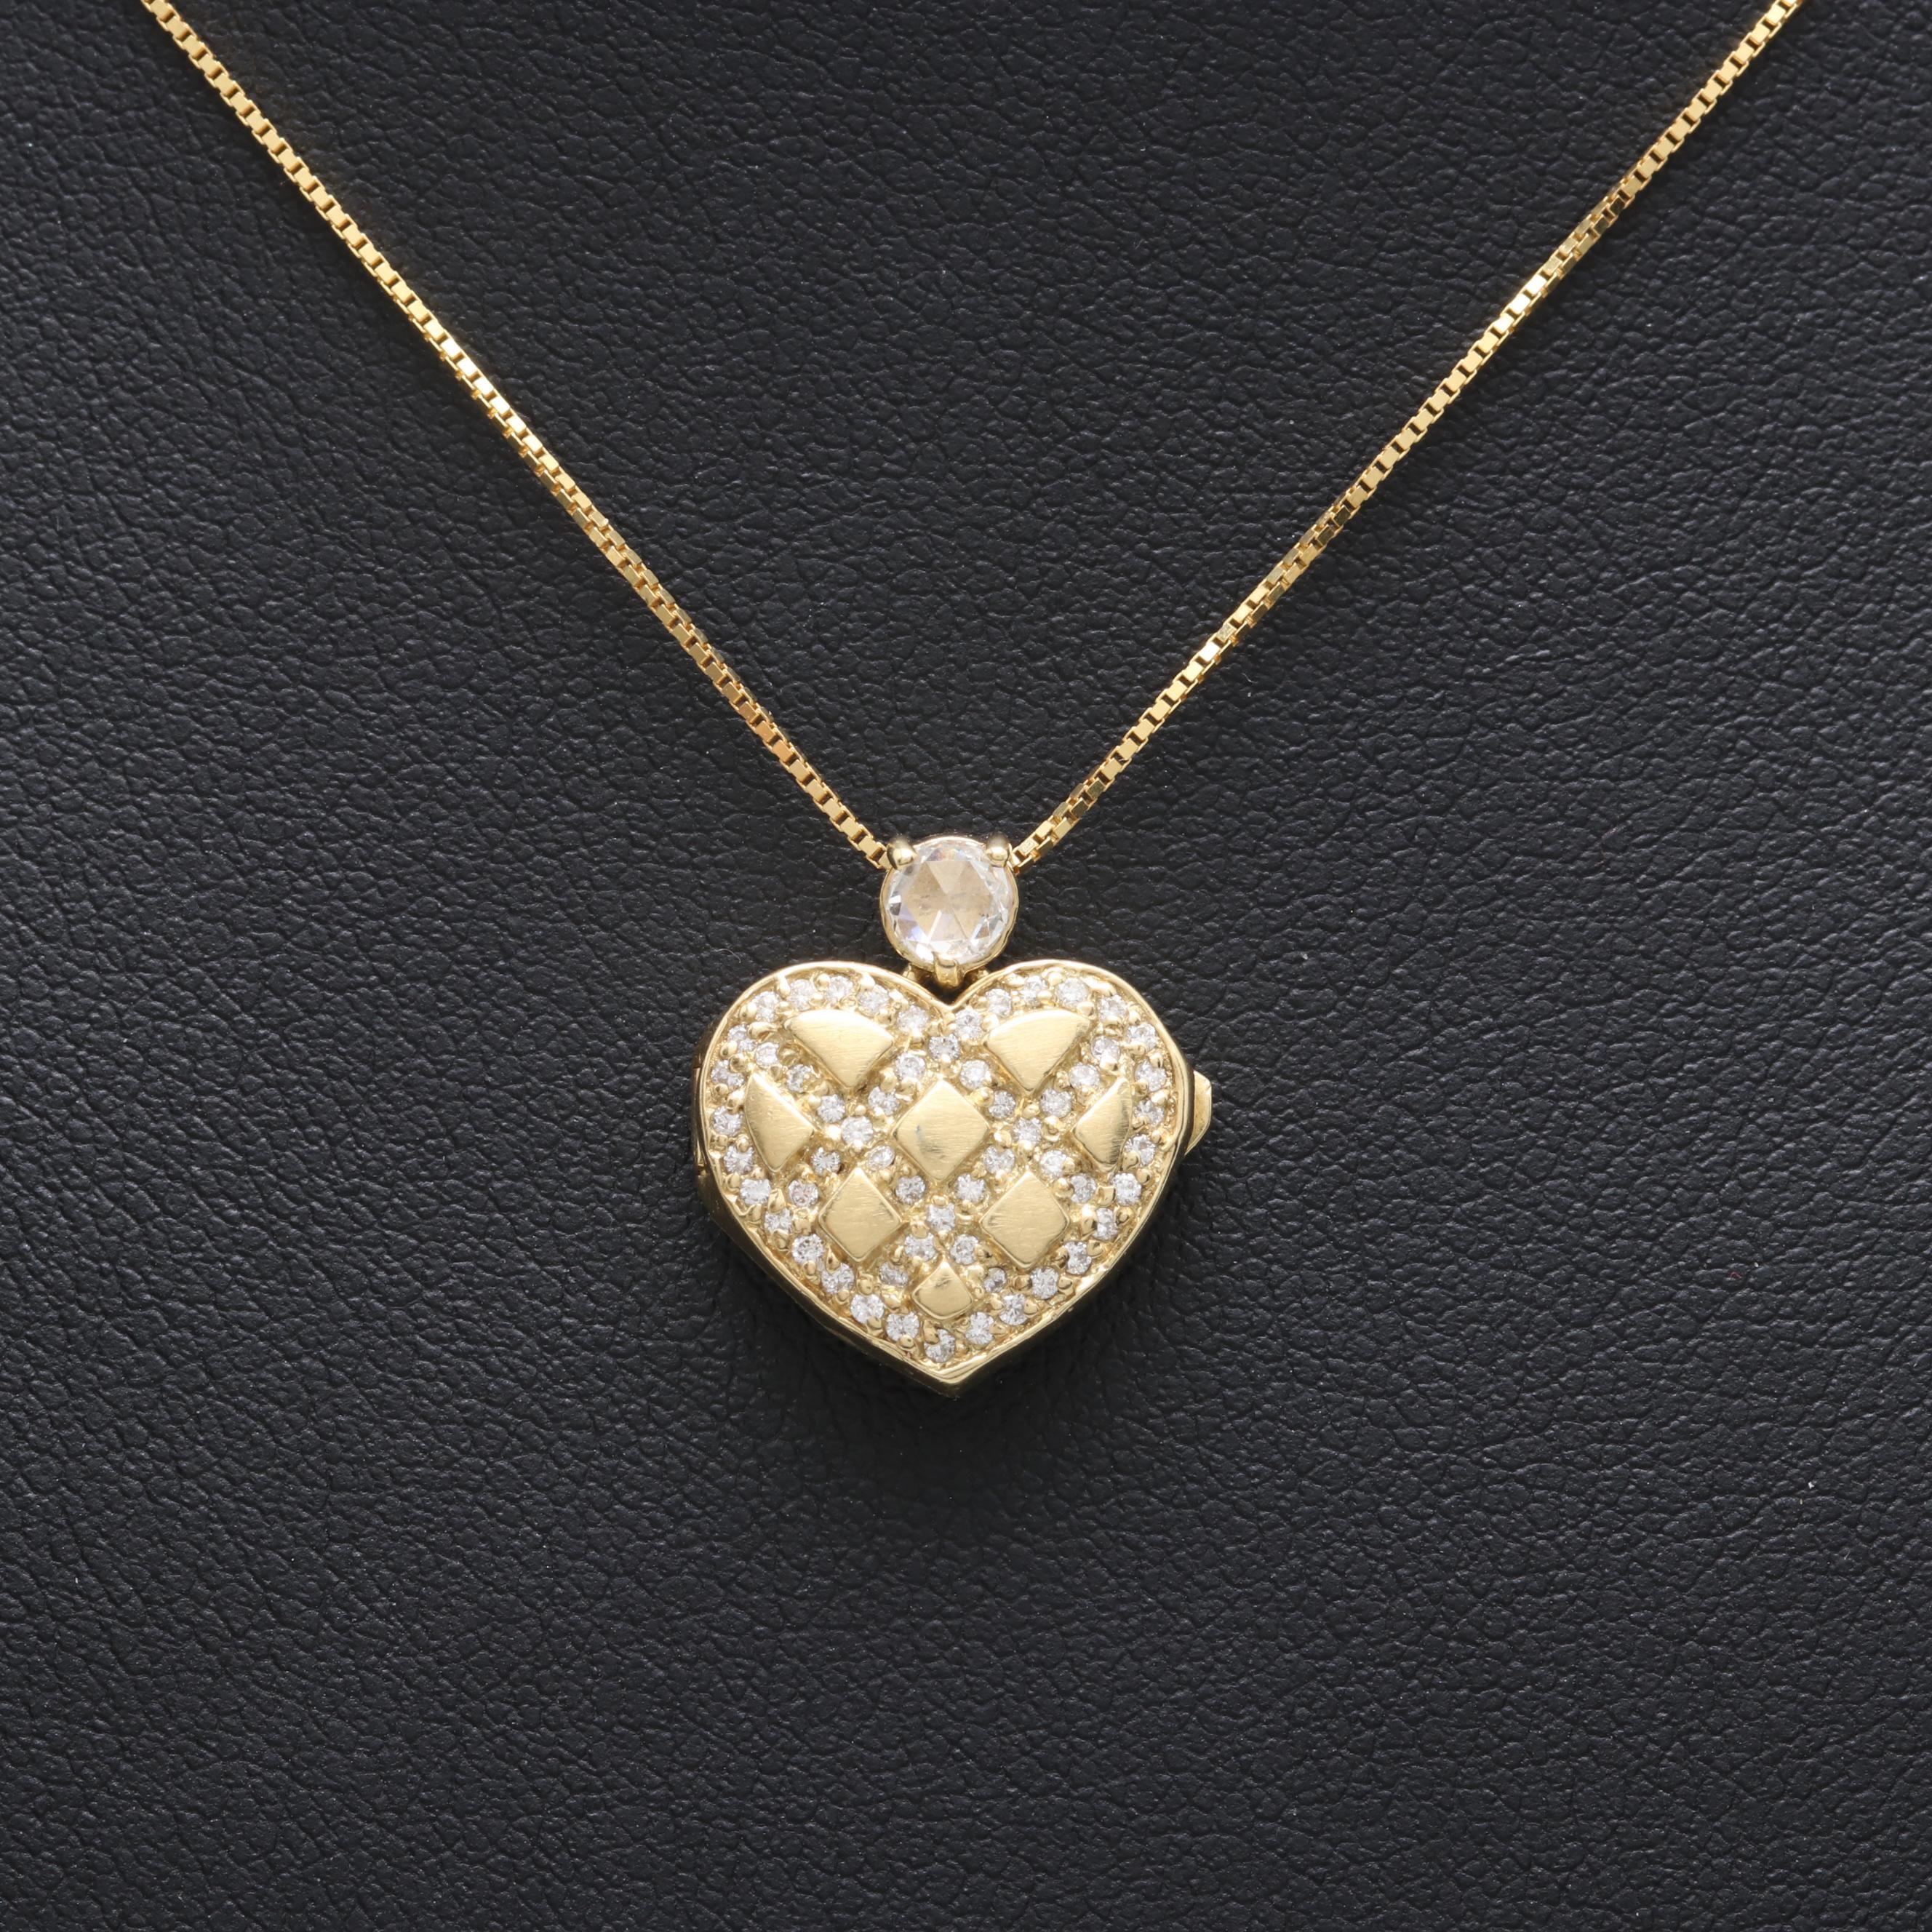 14K Yellow Gold Diamond Heart Locket Necklace